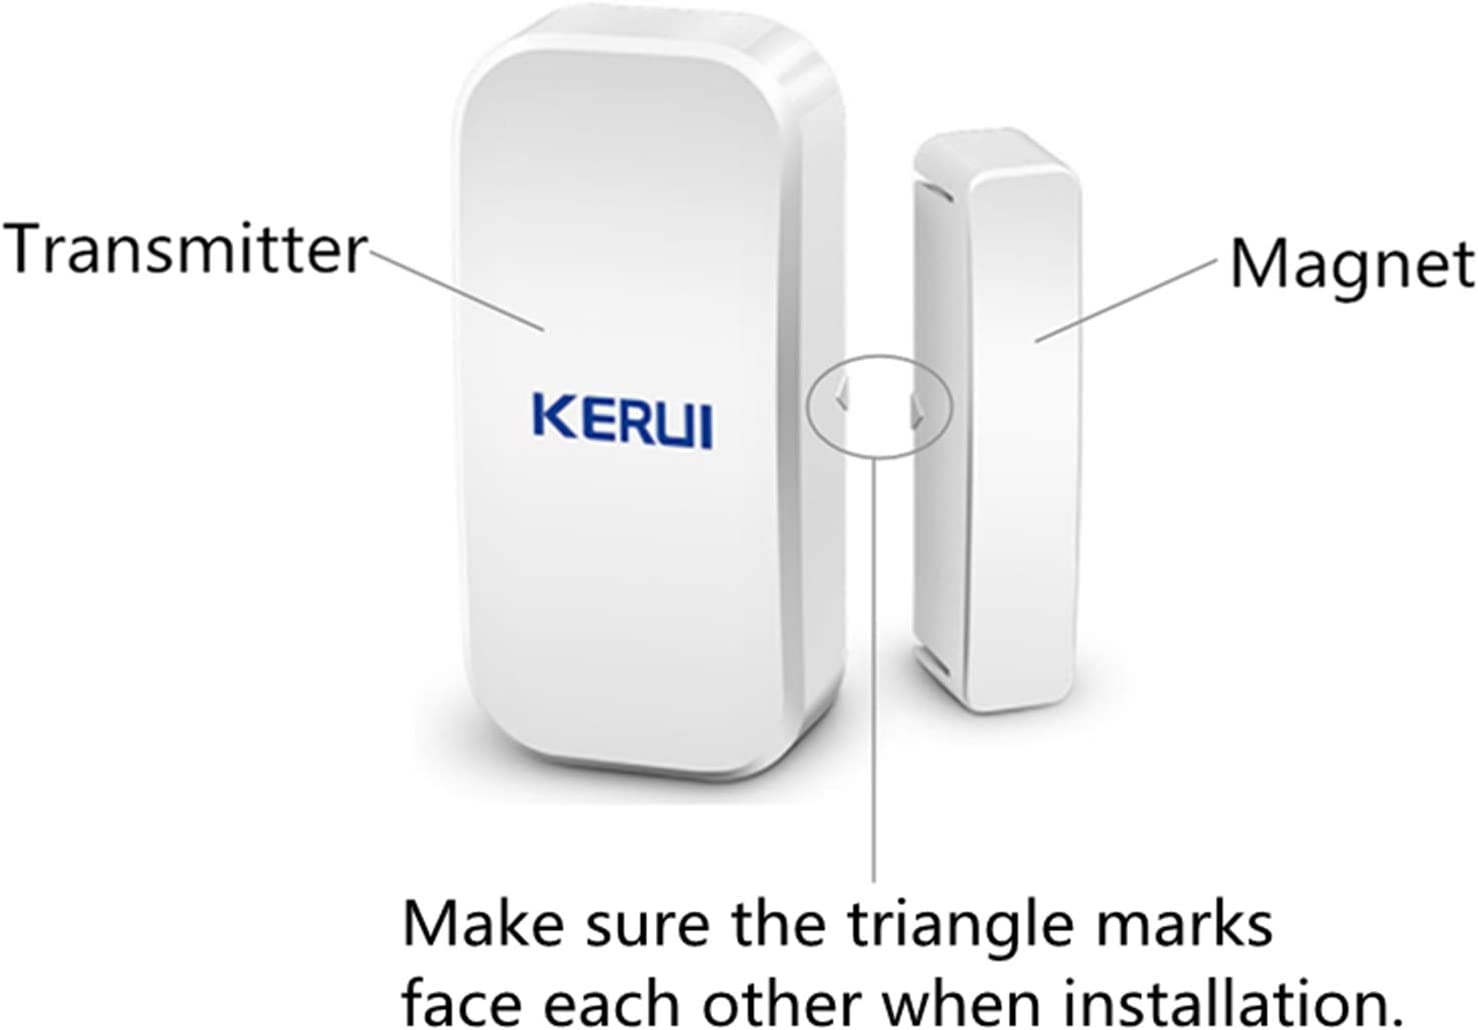 KERUI 2PCS Wireless Strobe Siren Suitable Home Security Alarm System